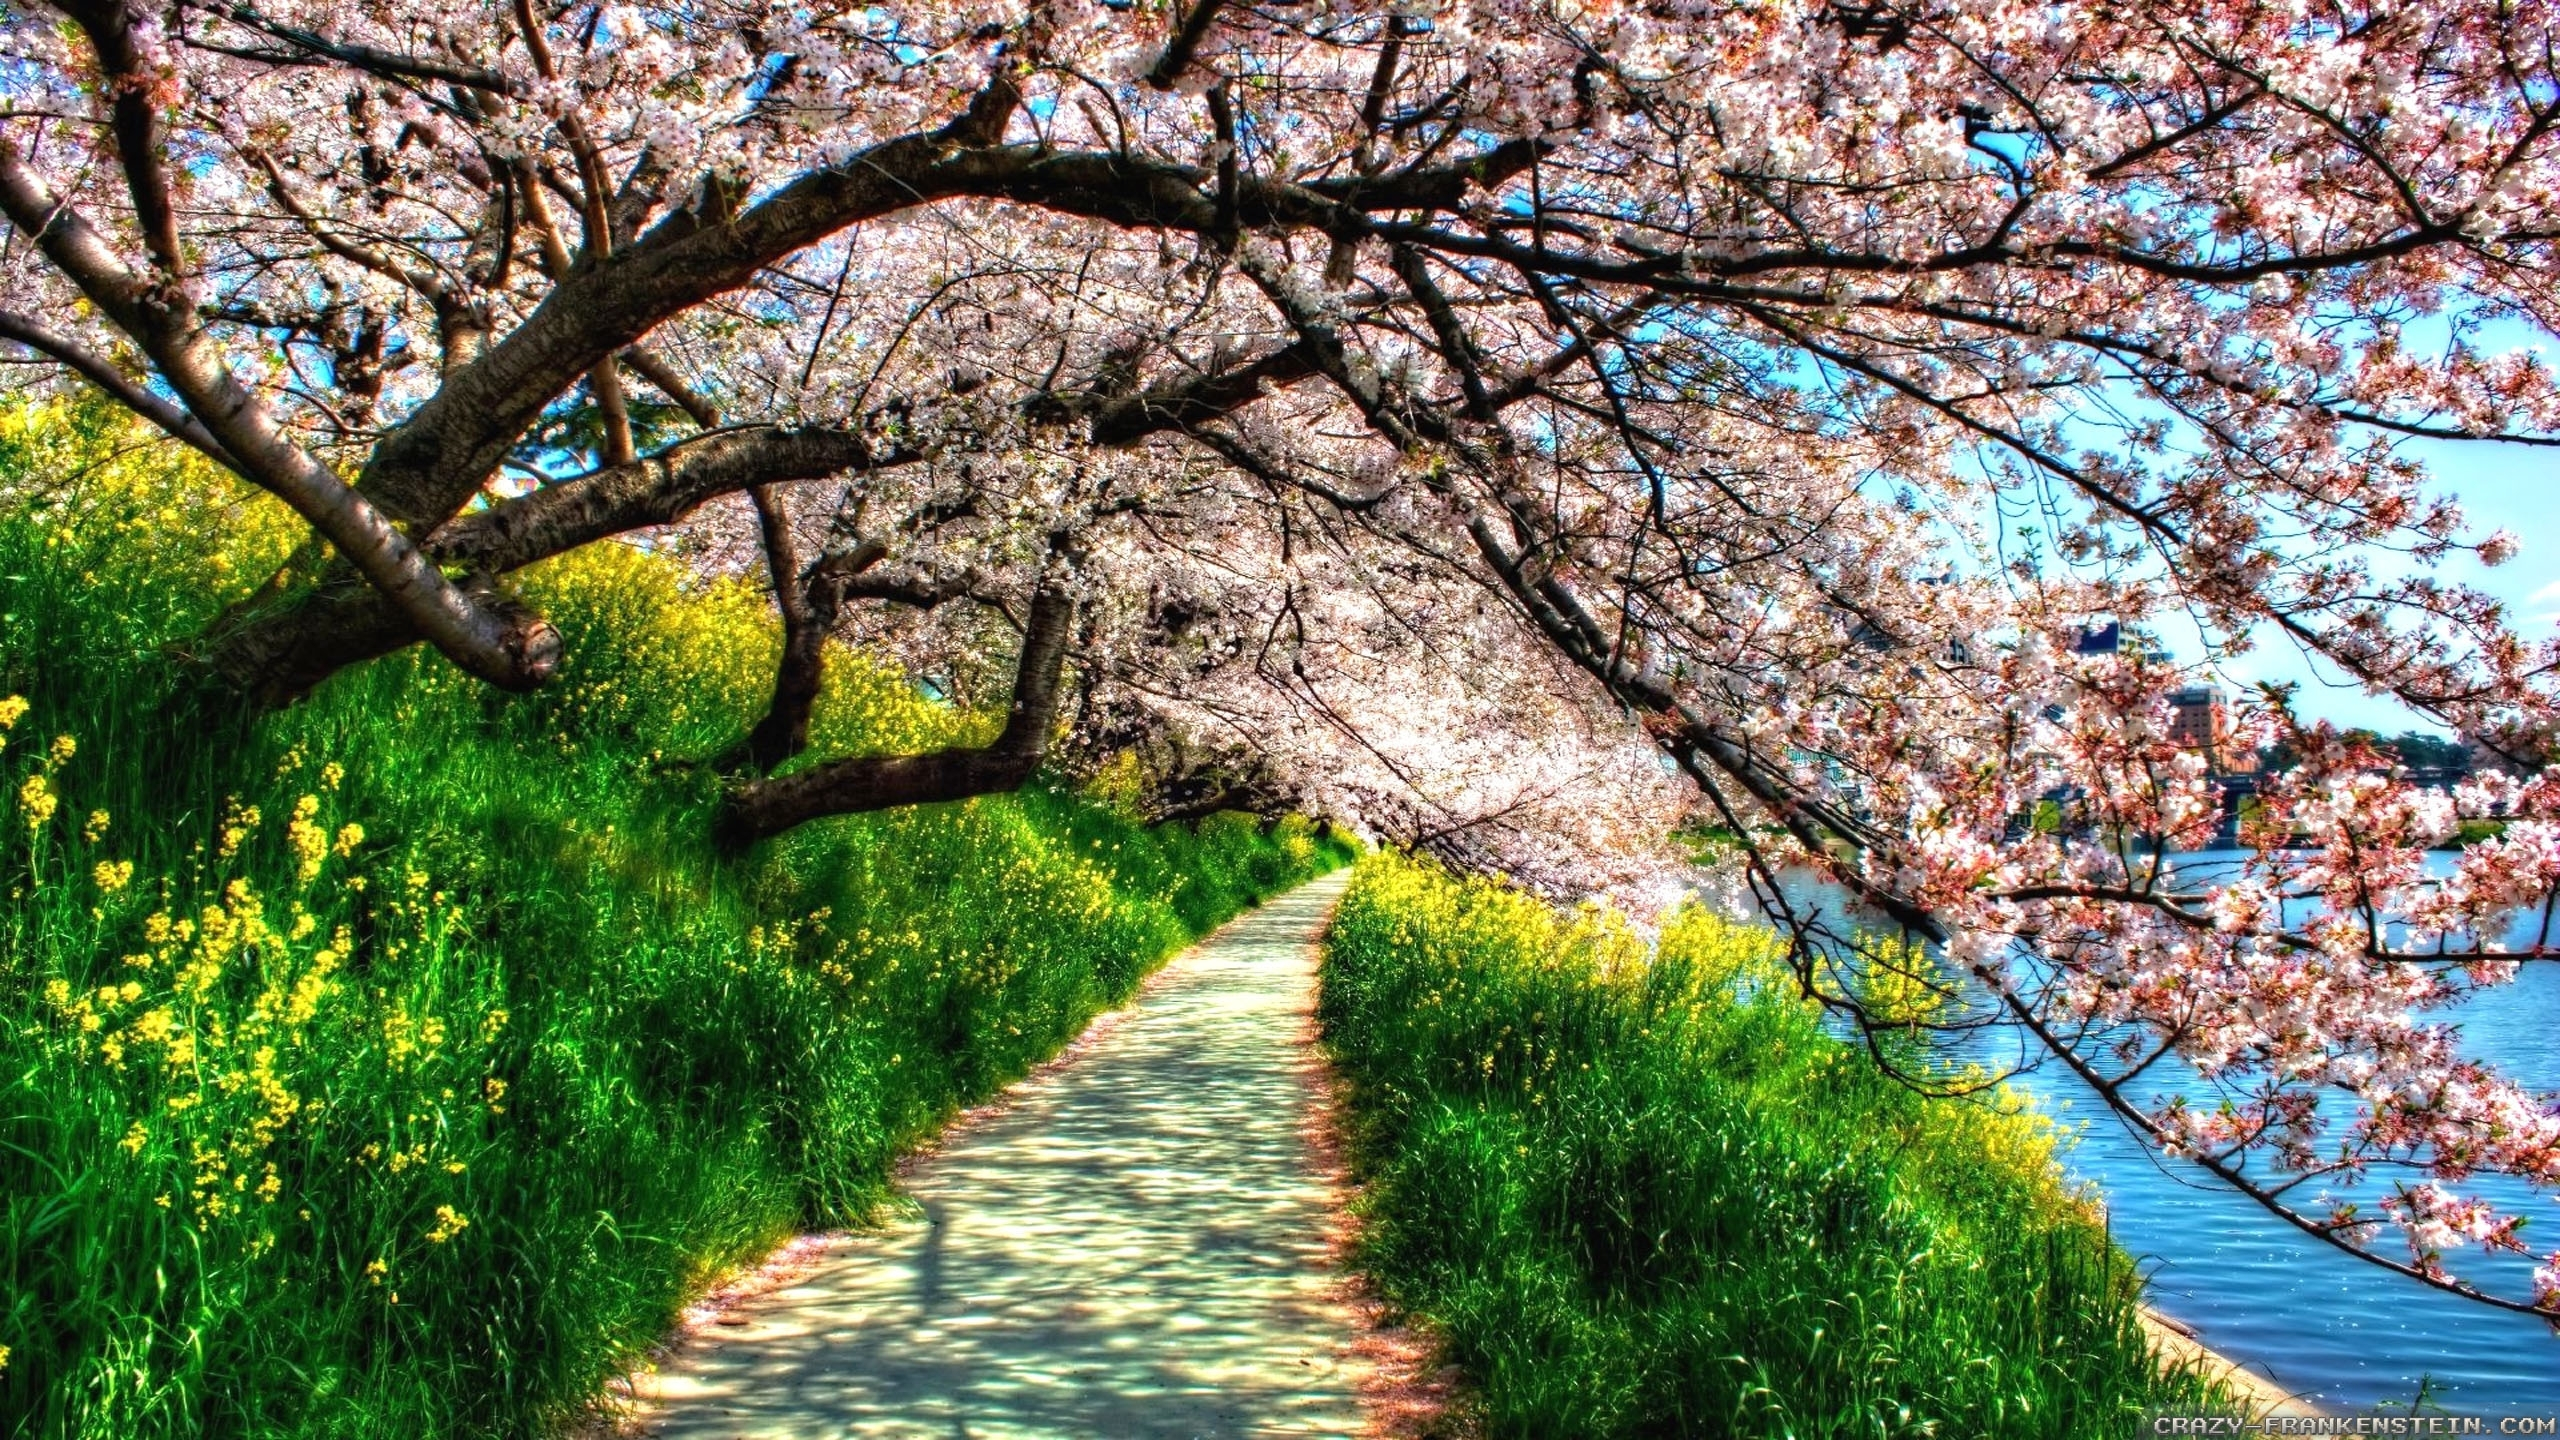 nature spring image #6895 - hdwarena